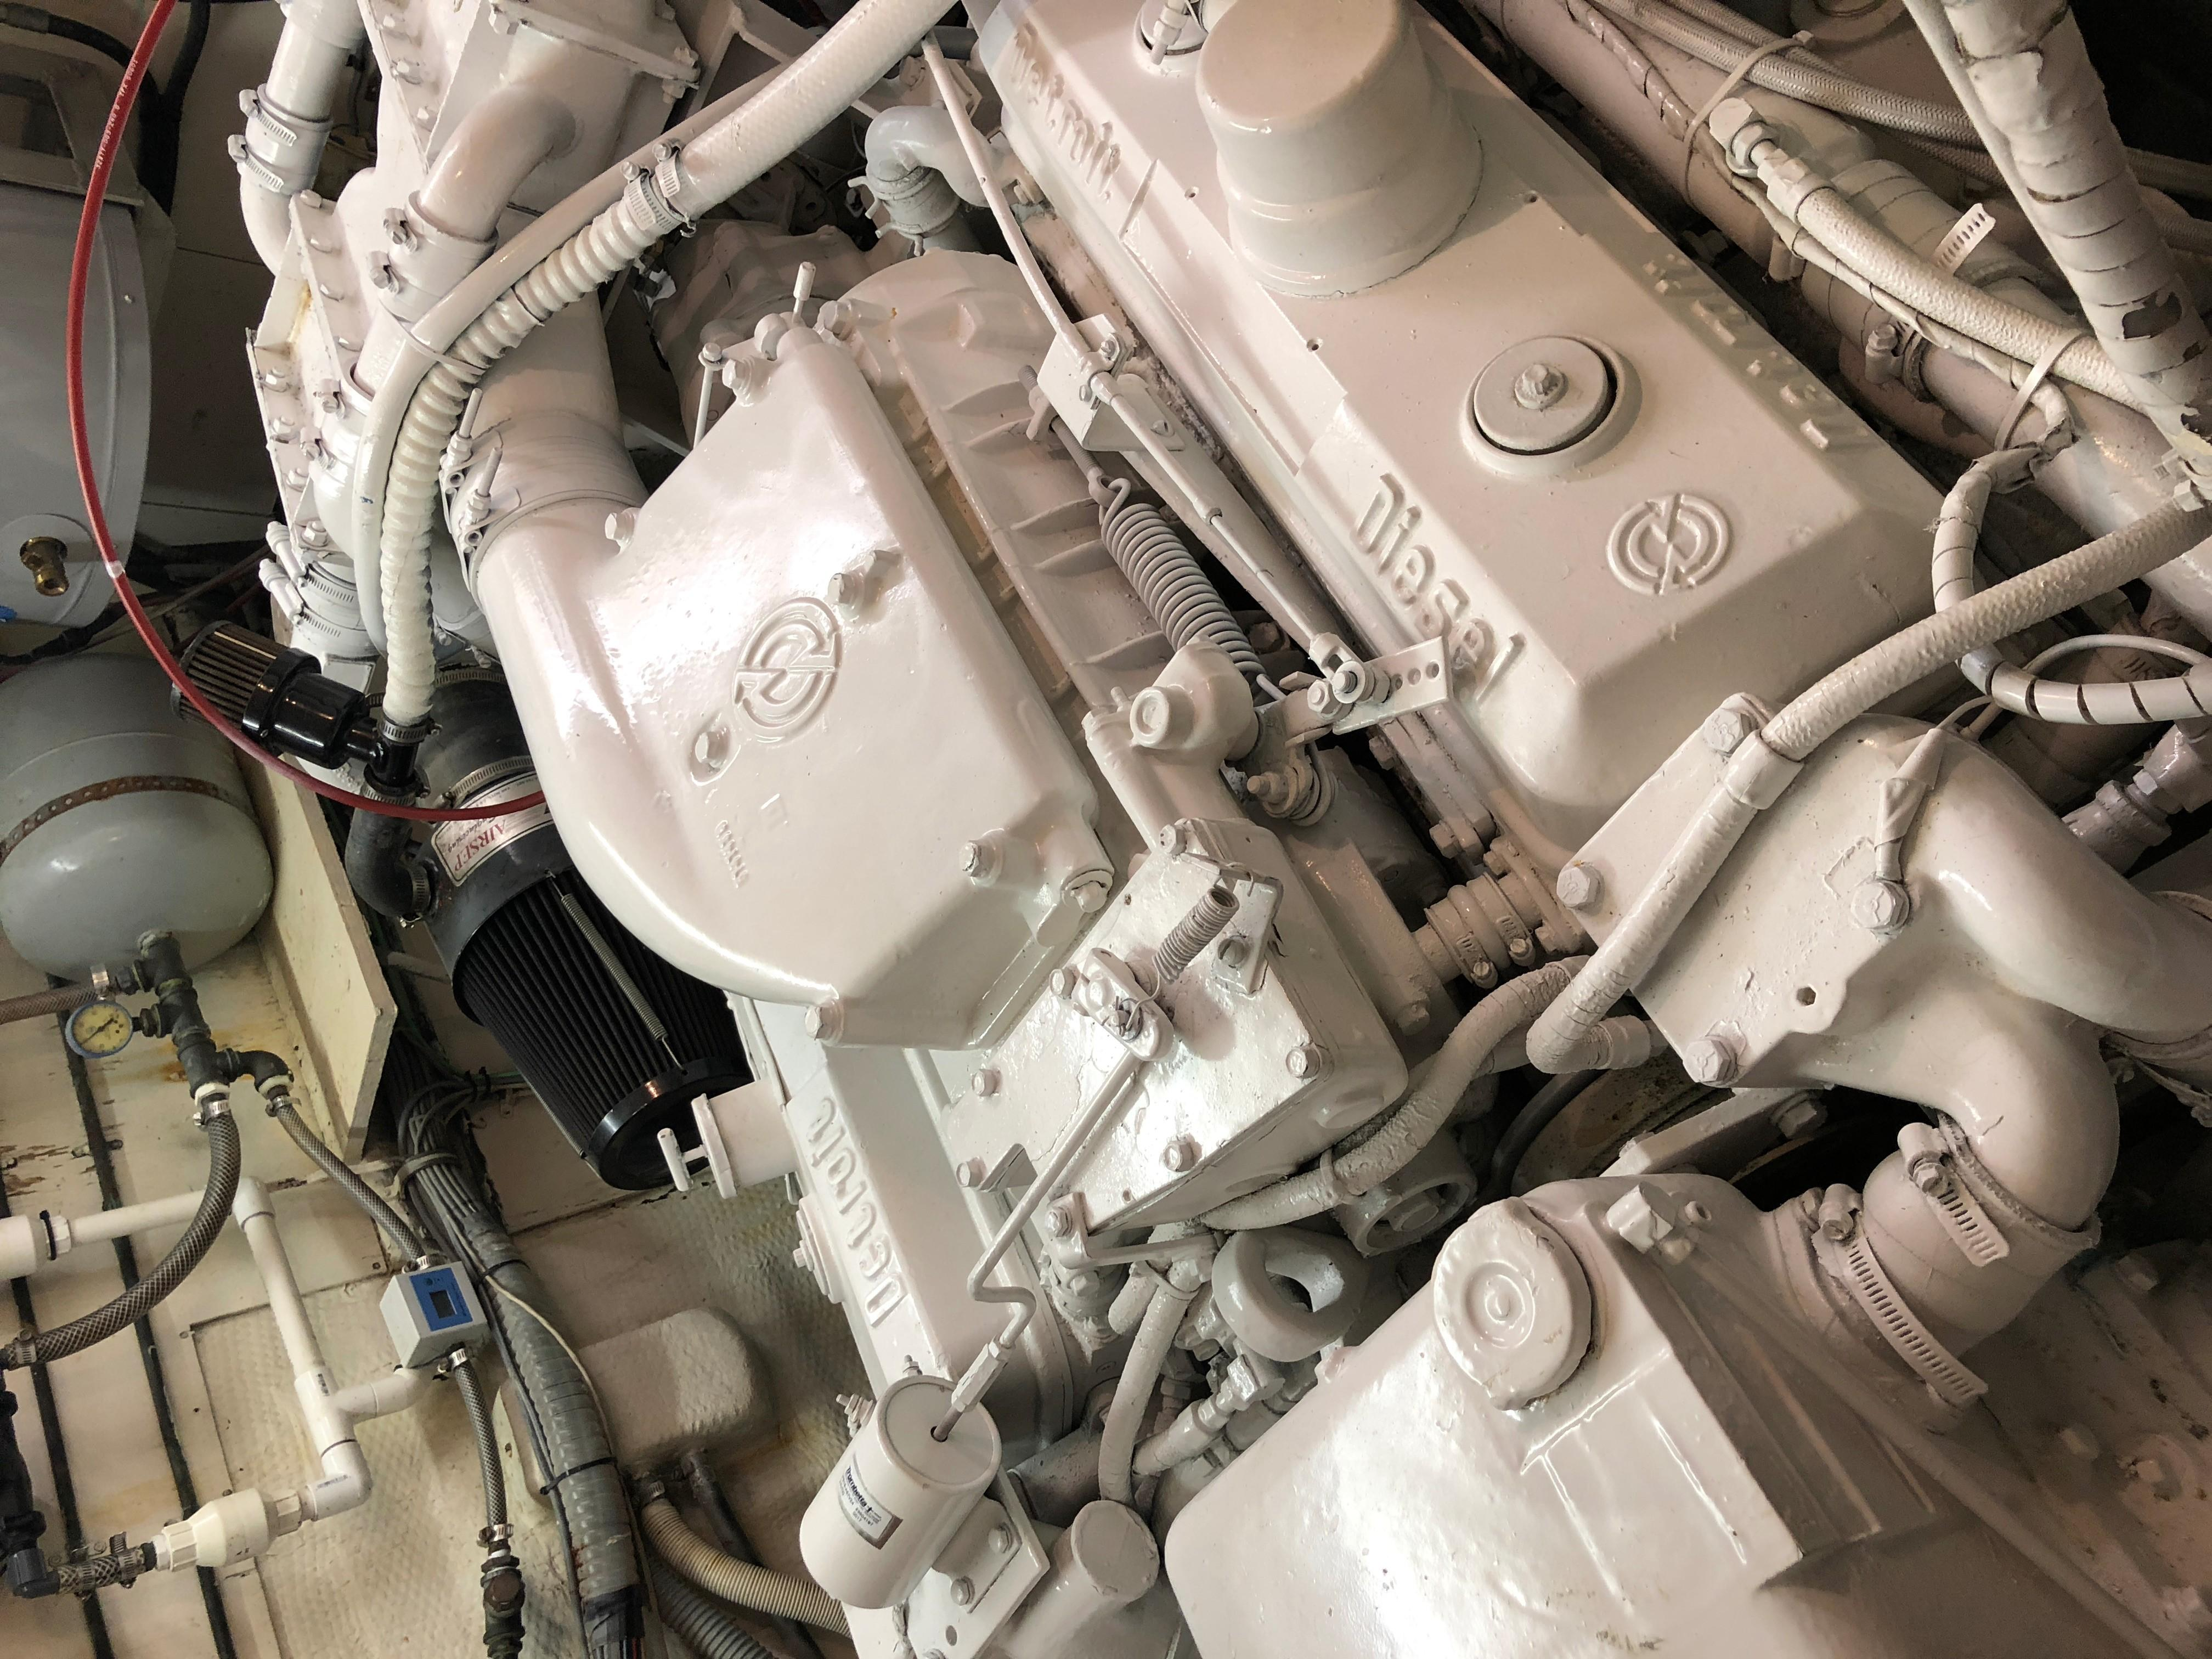 Hatteras 53 Motor Yacht - Detroit Diesel 8V71TI